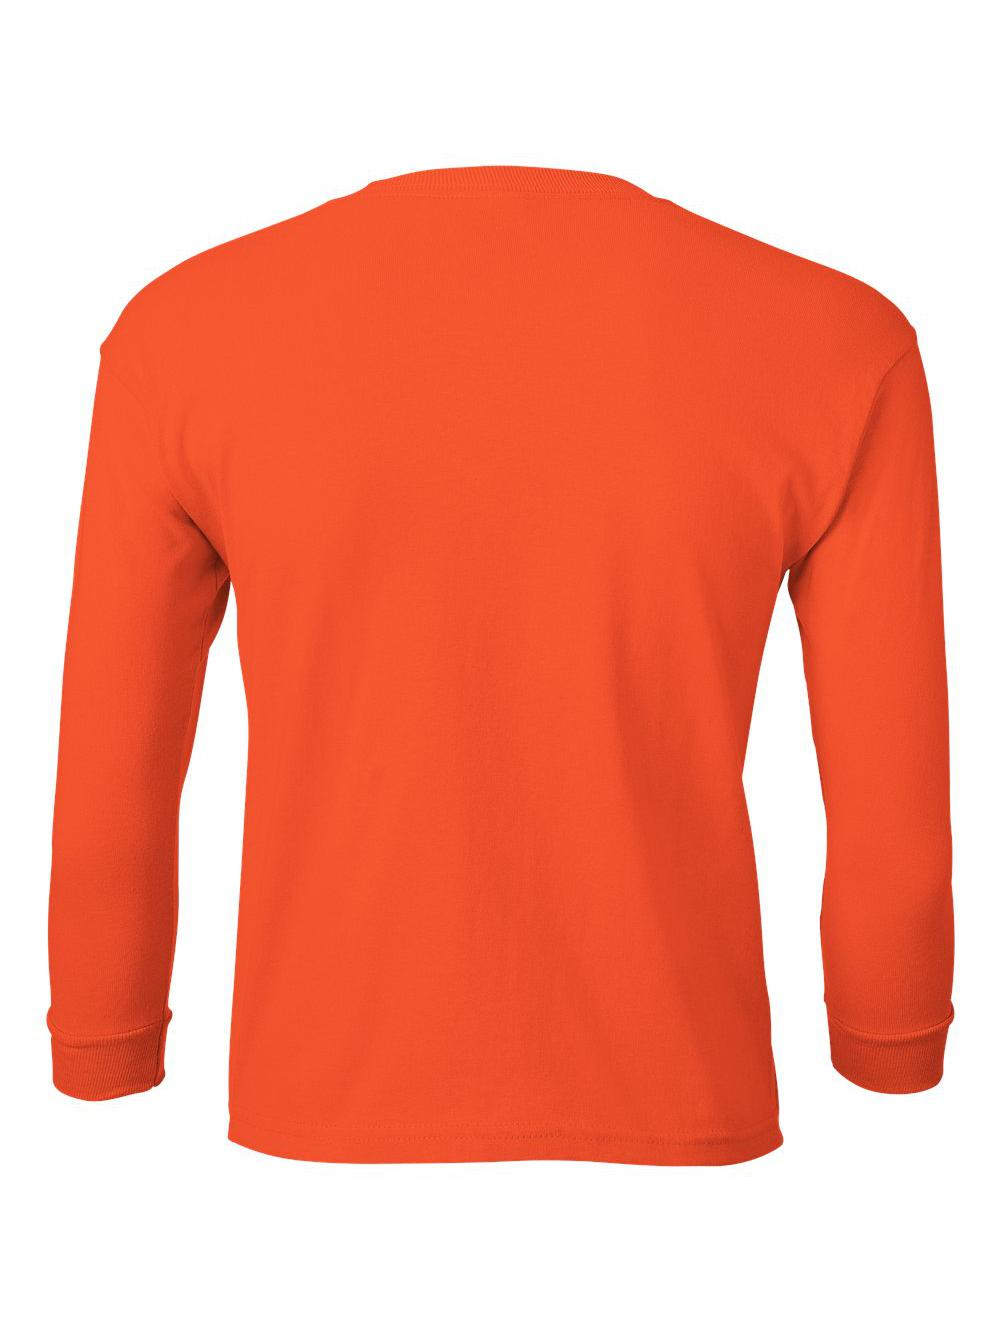 Gildan-Ultra-Cotton-Youth-Long-Sleeve-T-Shirt-2400B thumbnail 28